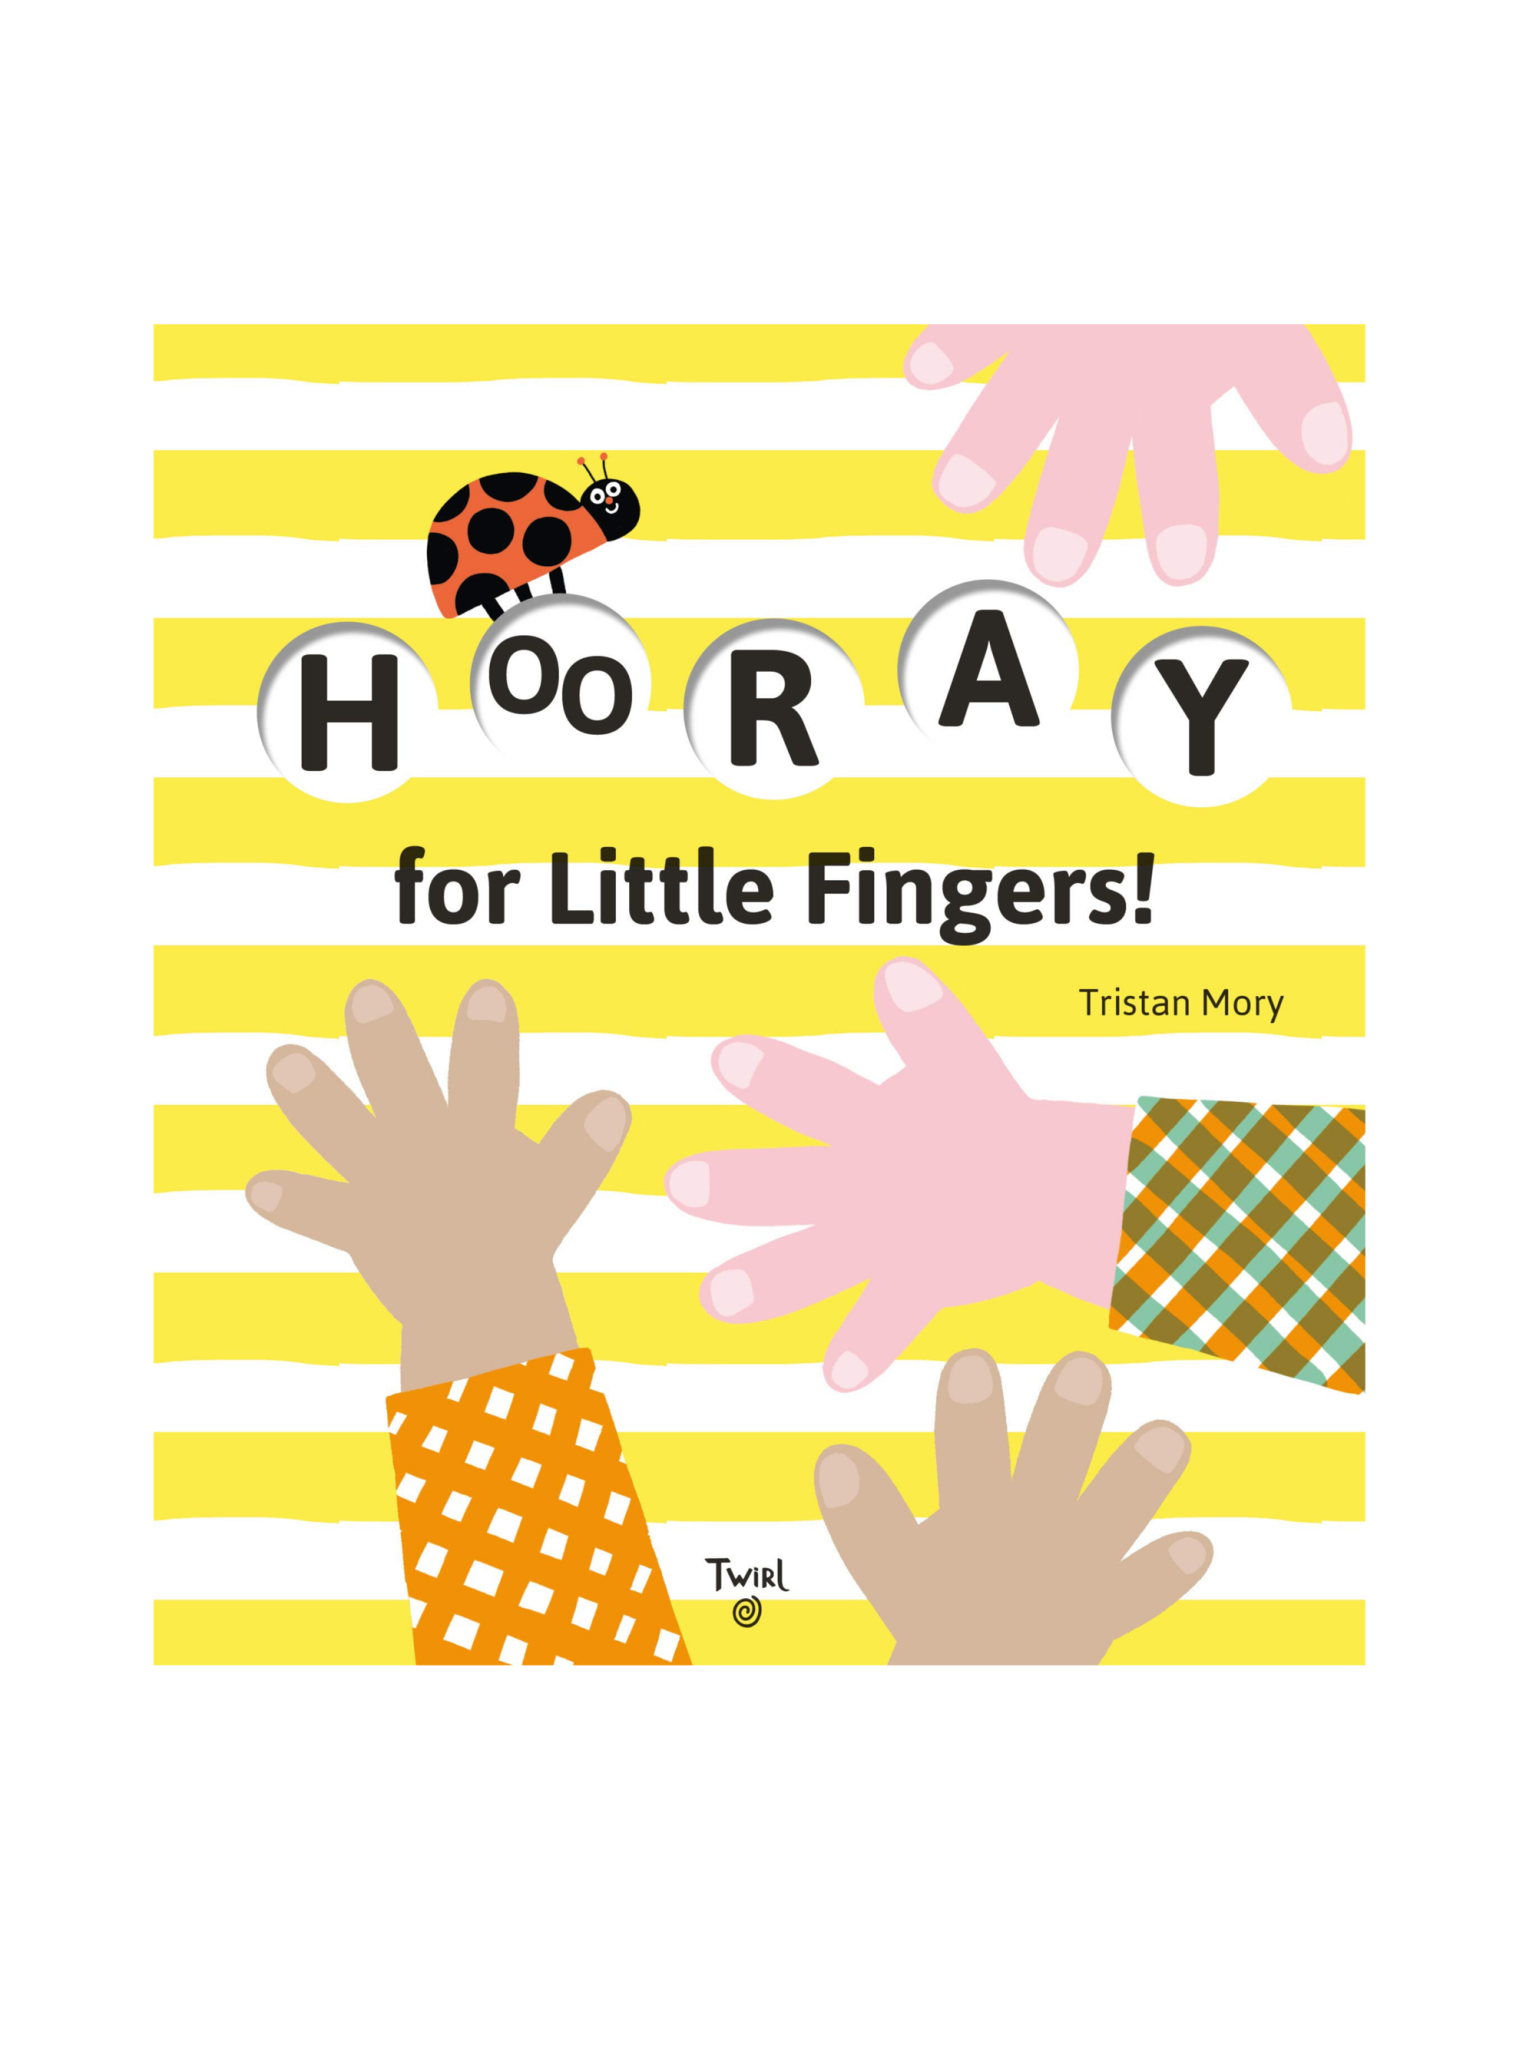 hachette book group Hooray for Little Fingers